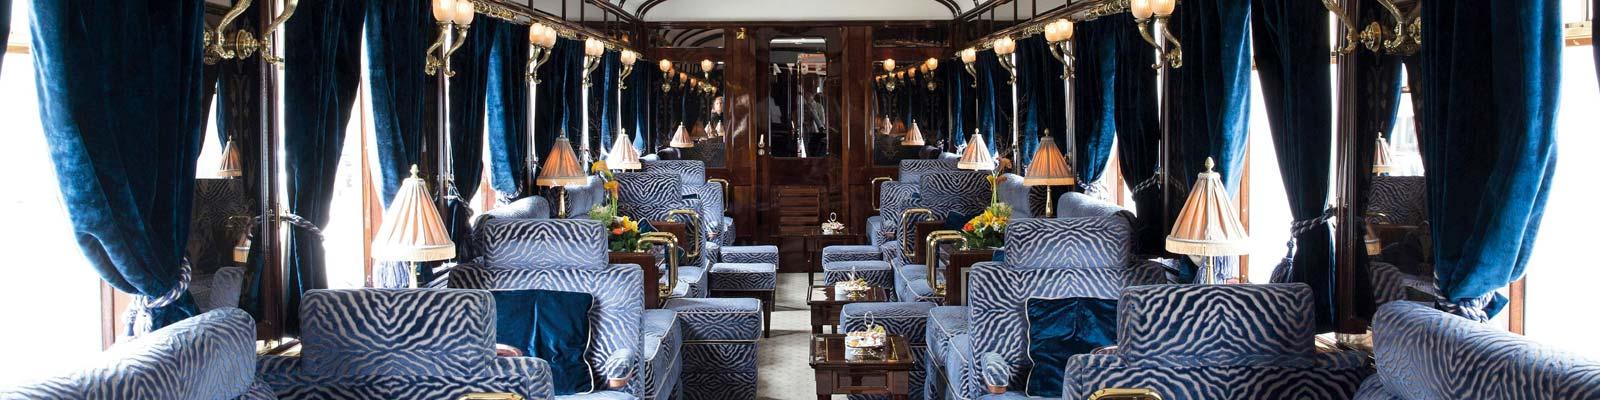 Venice Simplon orient Express Luxury Train Journeys